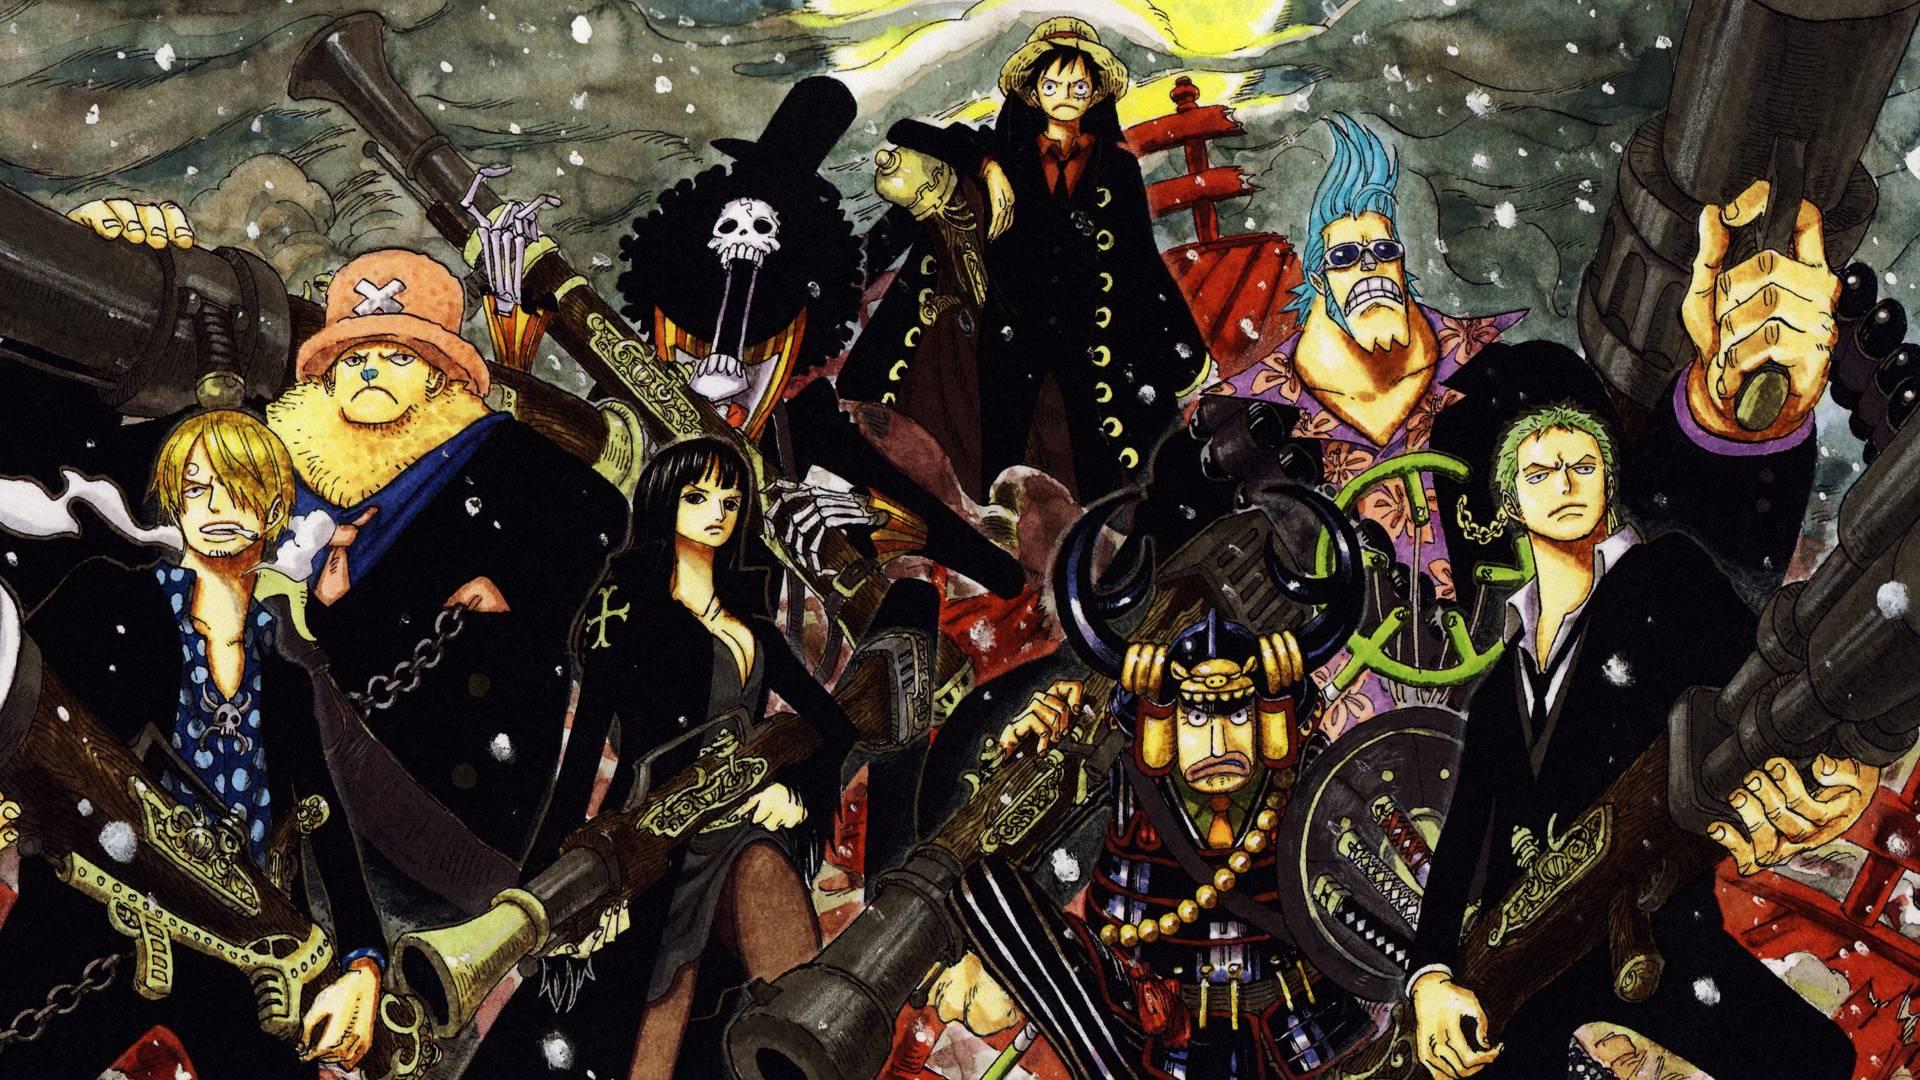 Nice Black Dress One Piece Hd Free Wallpapers Hd Wallpaper